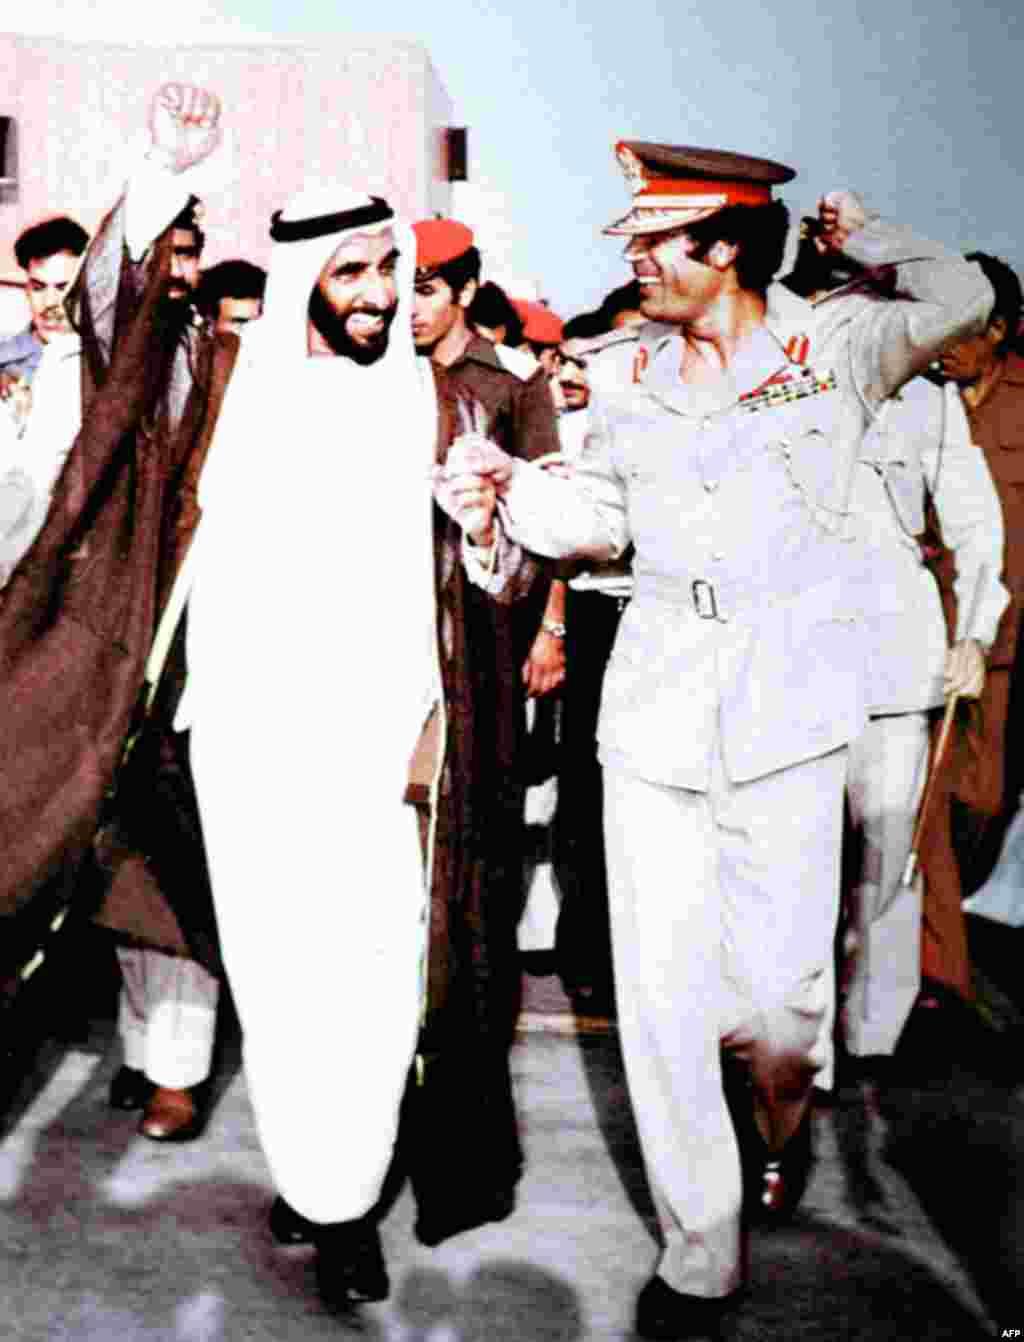 Президент ОАЭ шейх Заида бен Султана аль-Нахайяна (слева) на встрече с Муаммаром Каддафи в Ливии в 1979 году